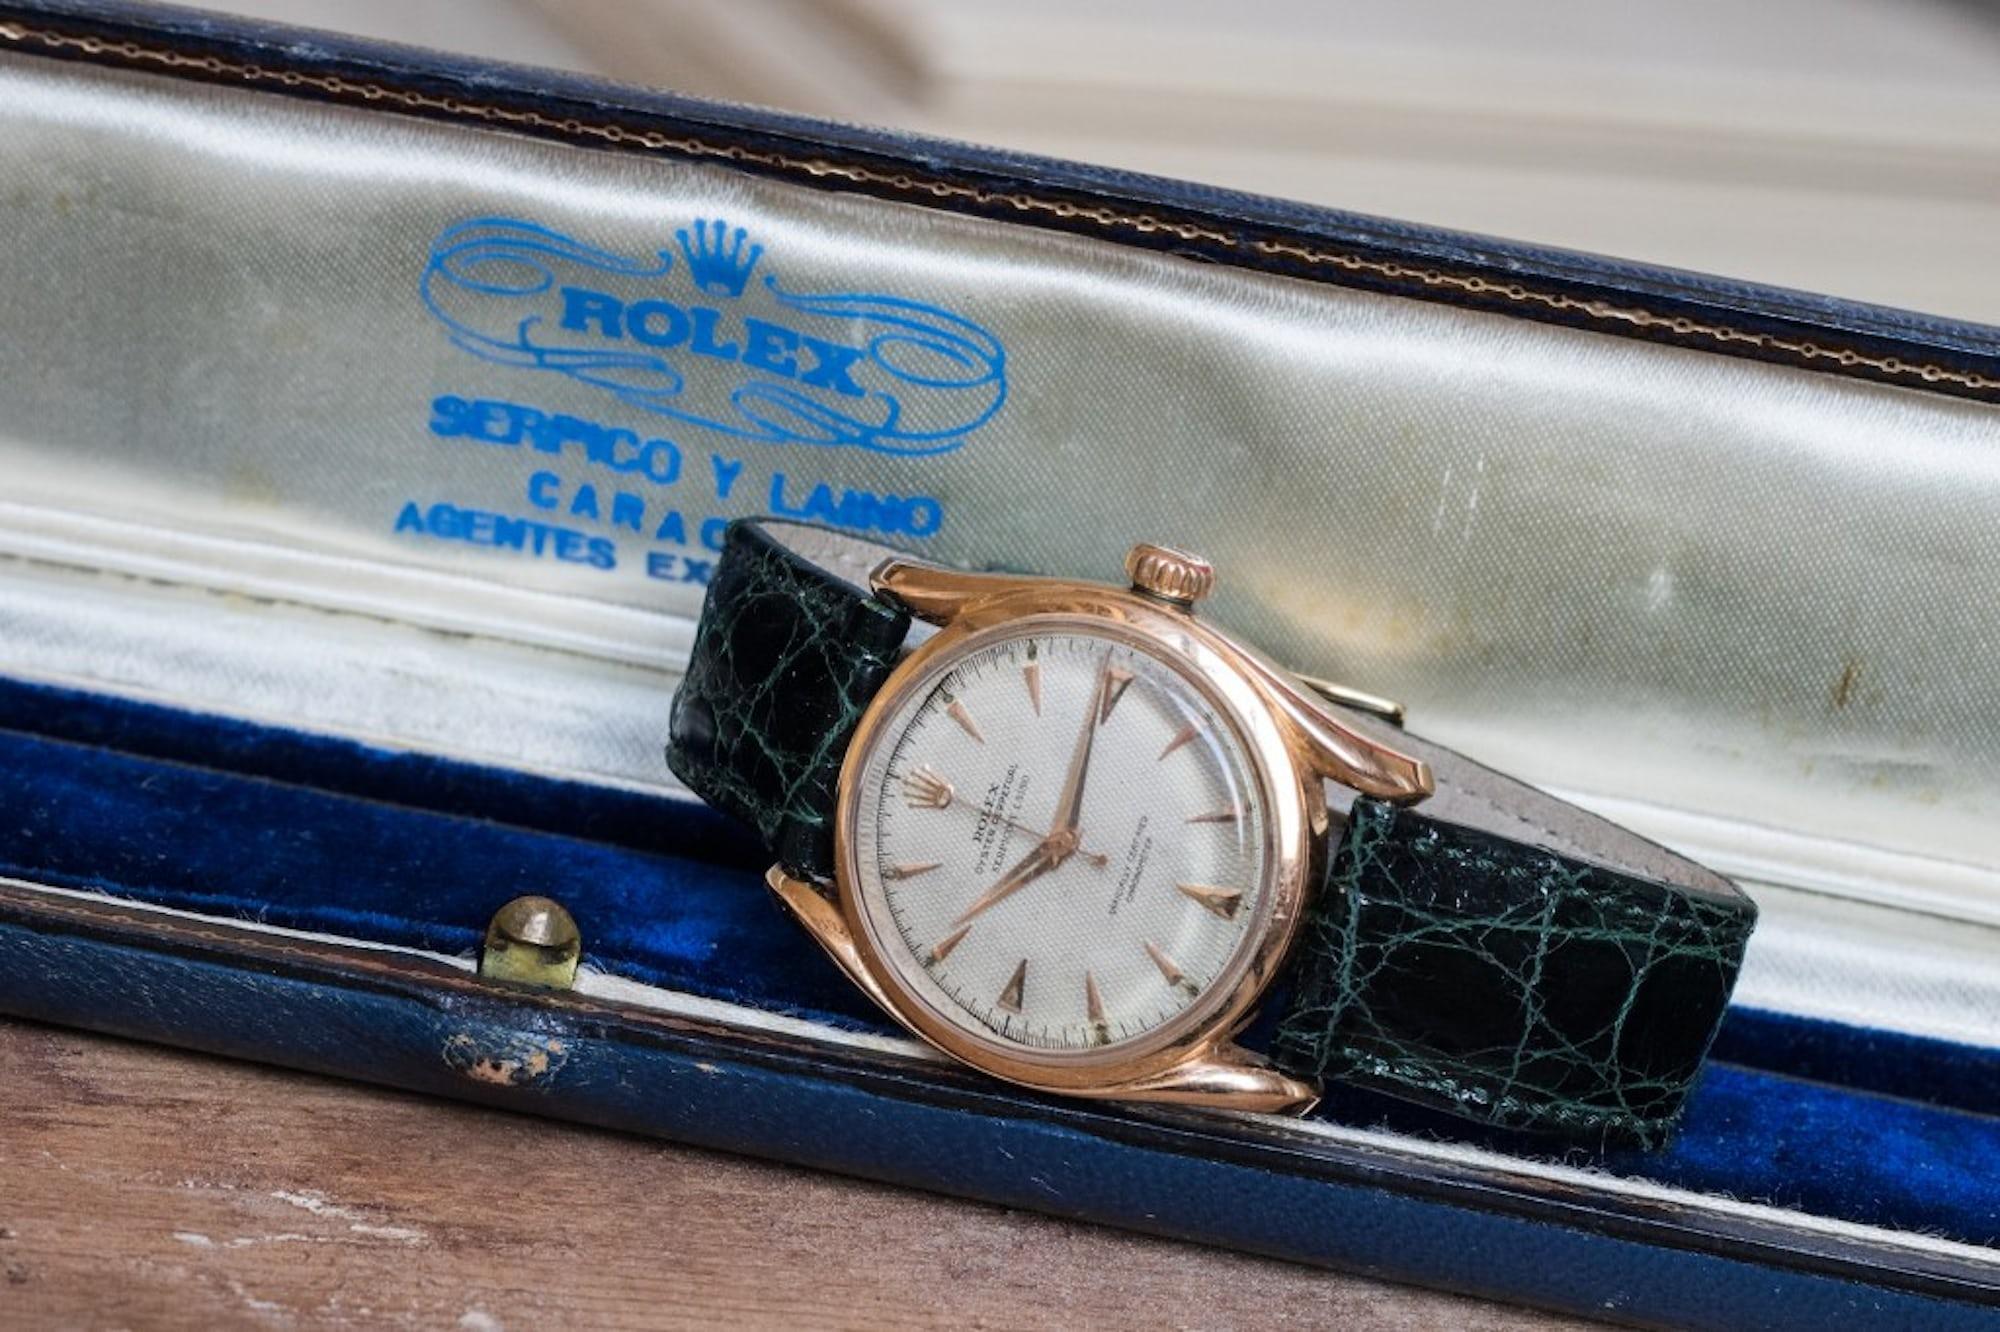 Rolex Serpico box.